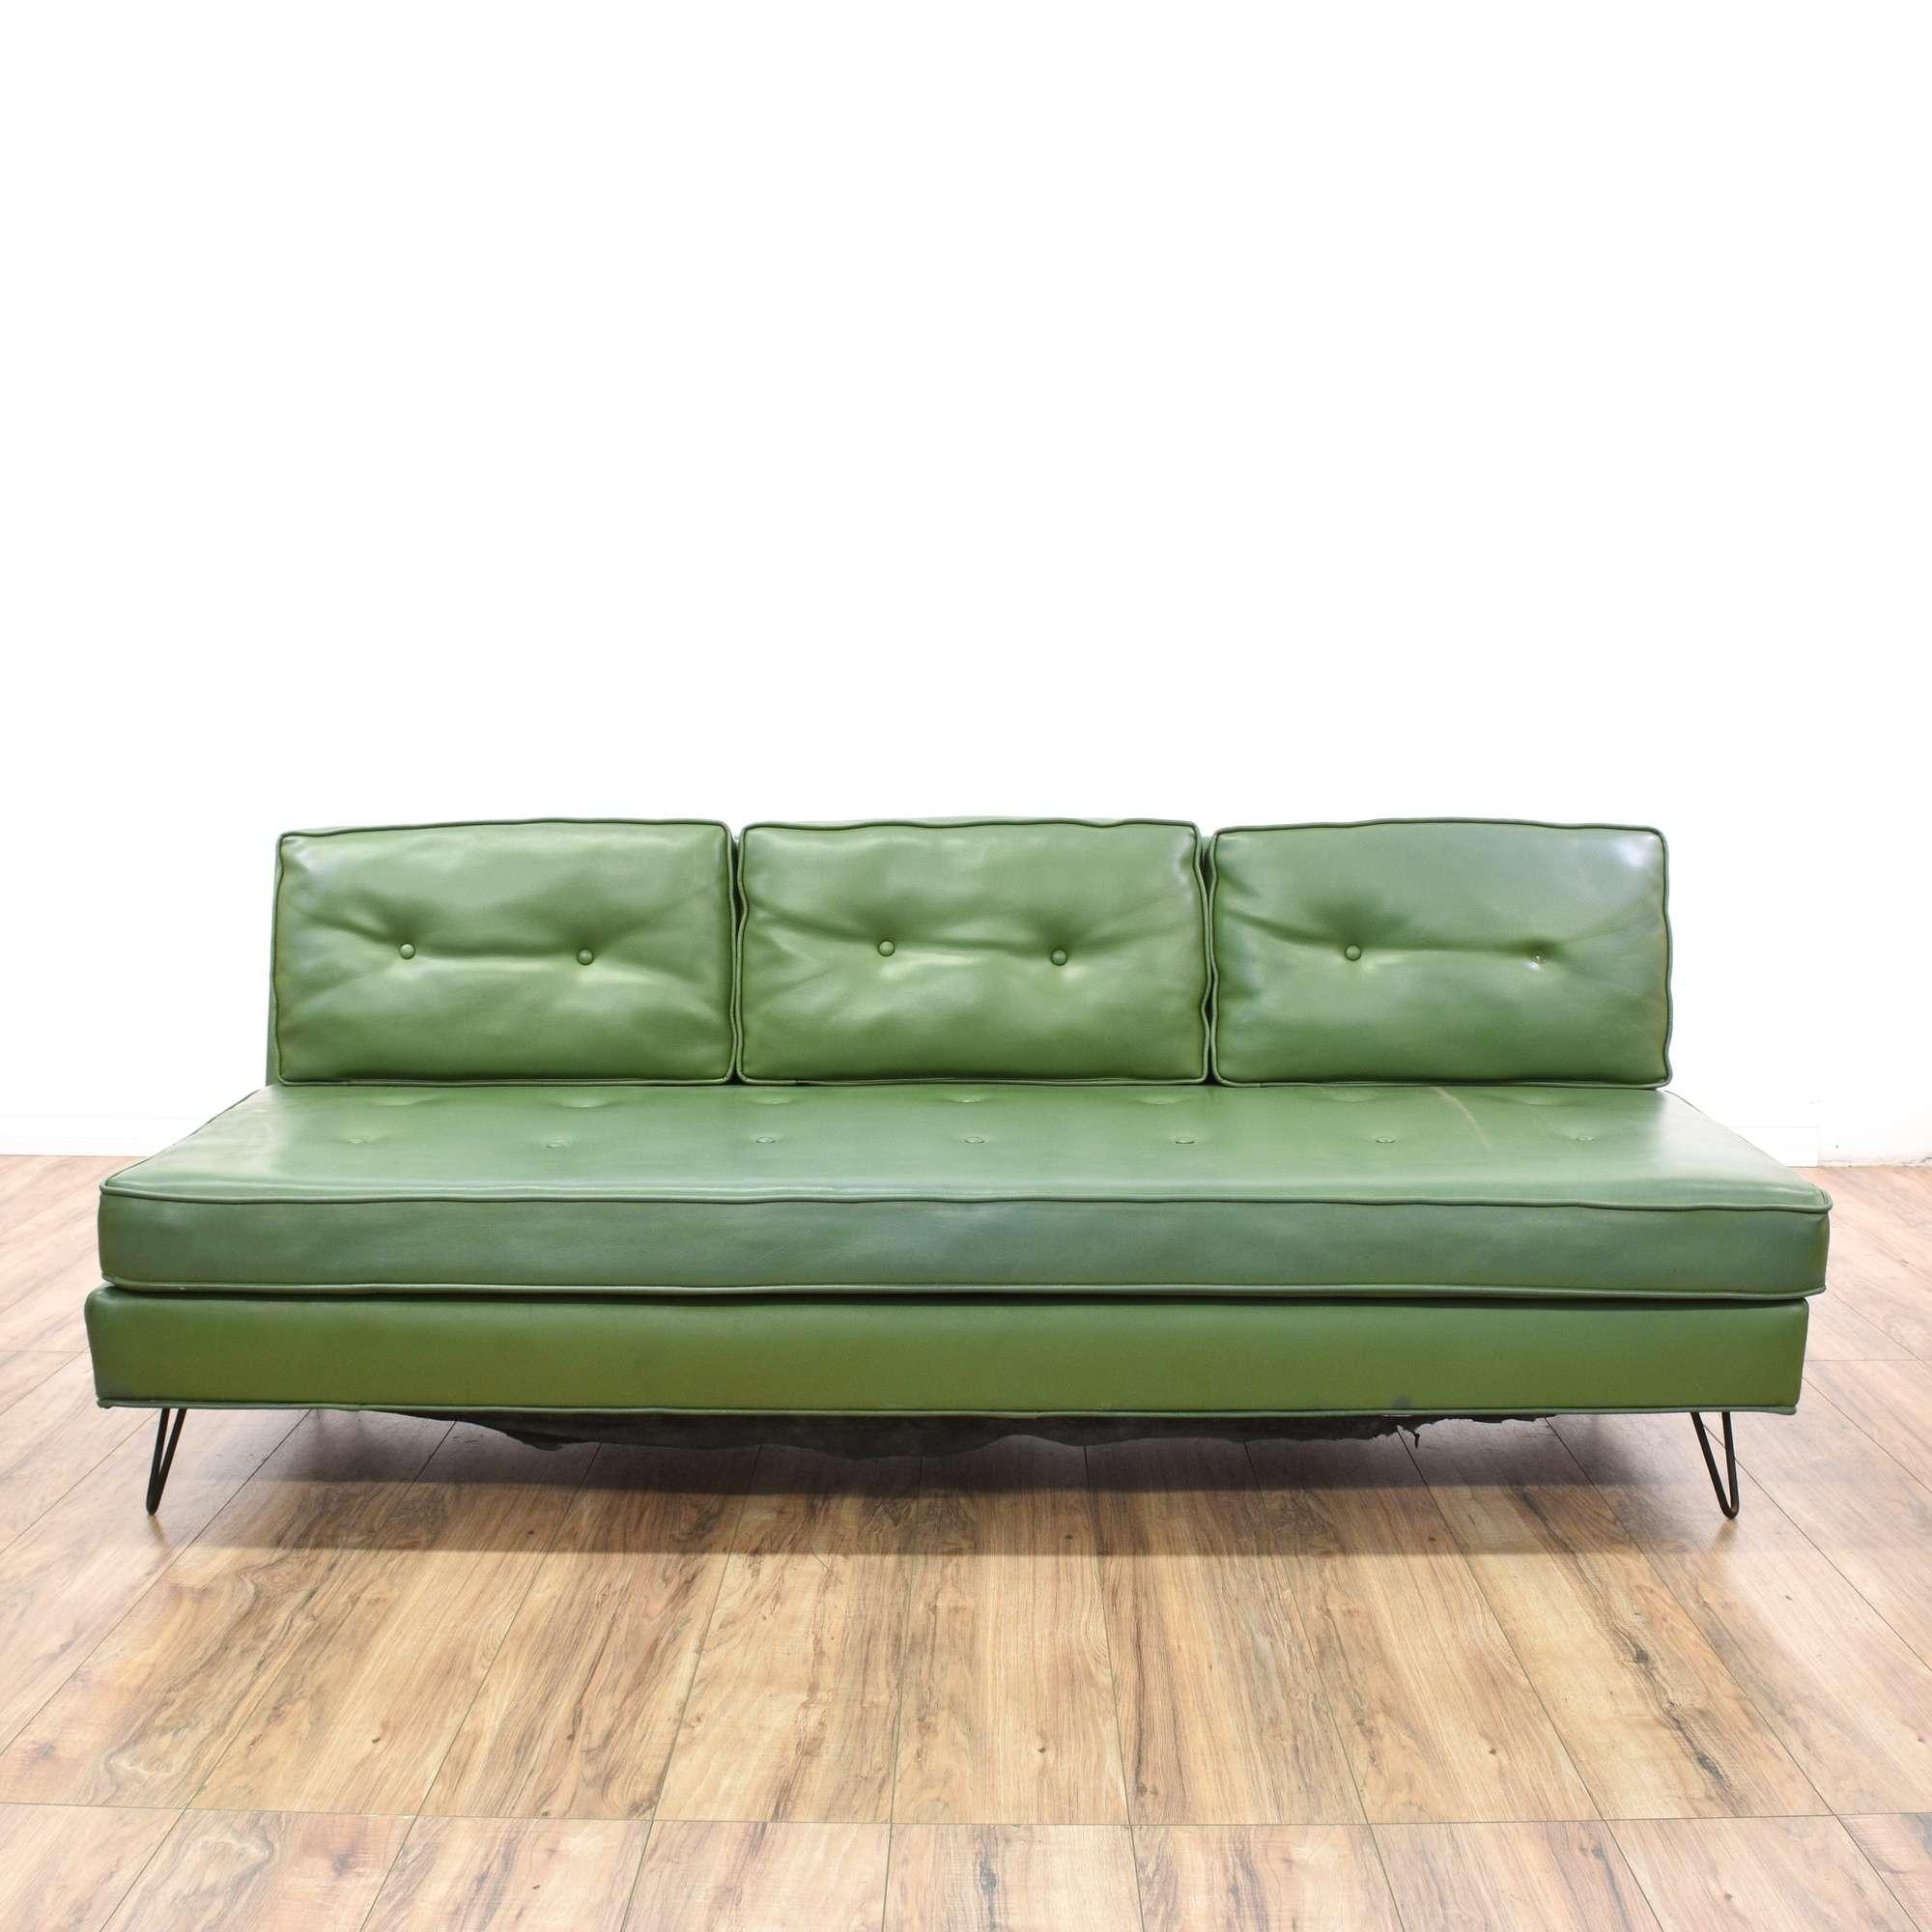 Mid Century Modern Green Vinyl Sofa | Loveseat Vintage ...